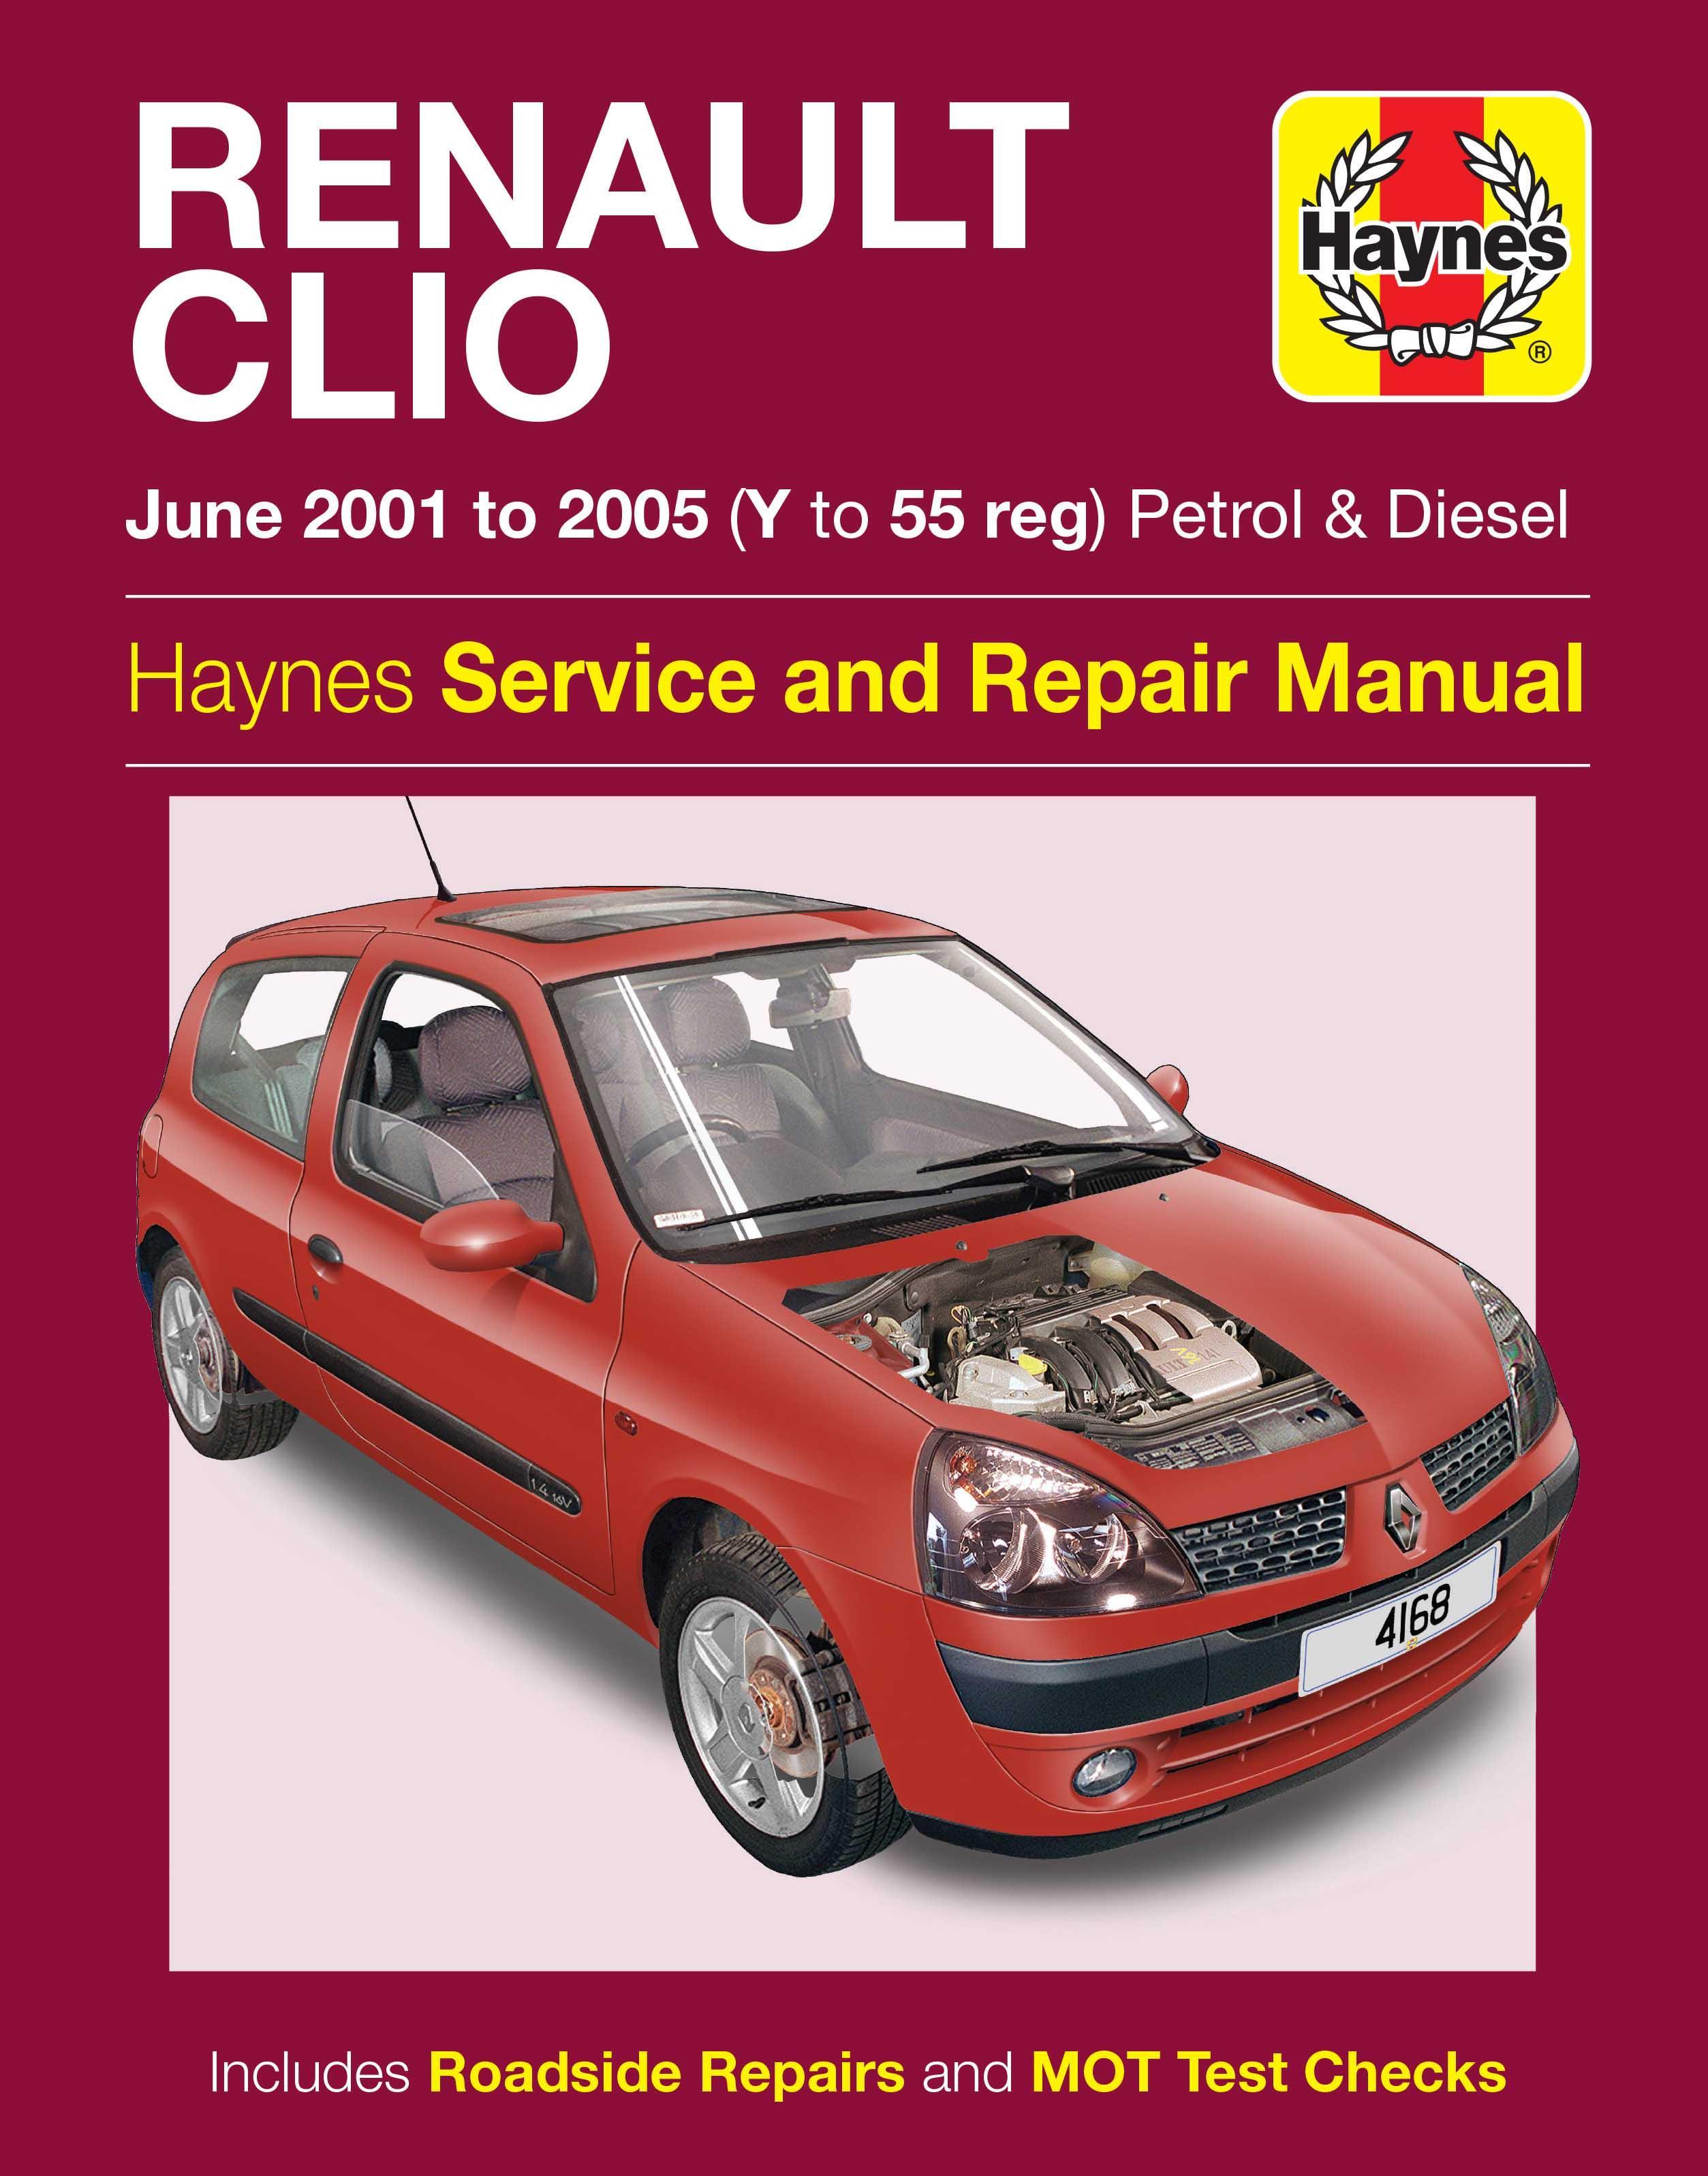 2001 renault clio manual basic instruction manual u2022 rh ryanshtuff co